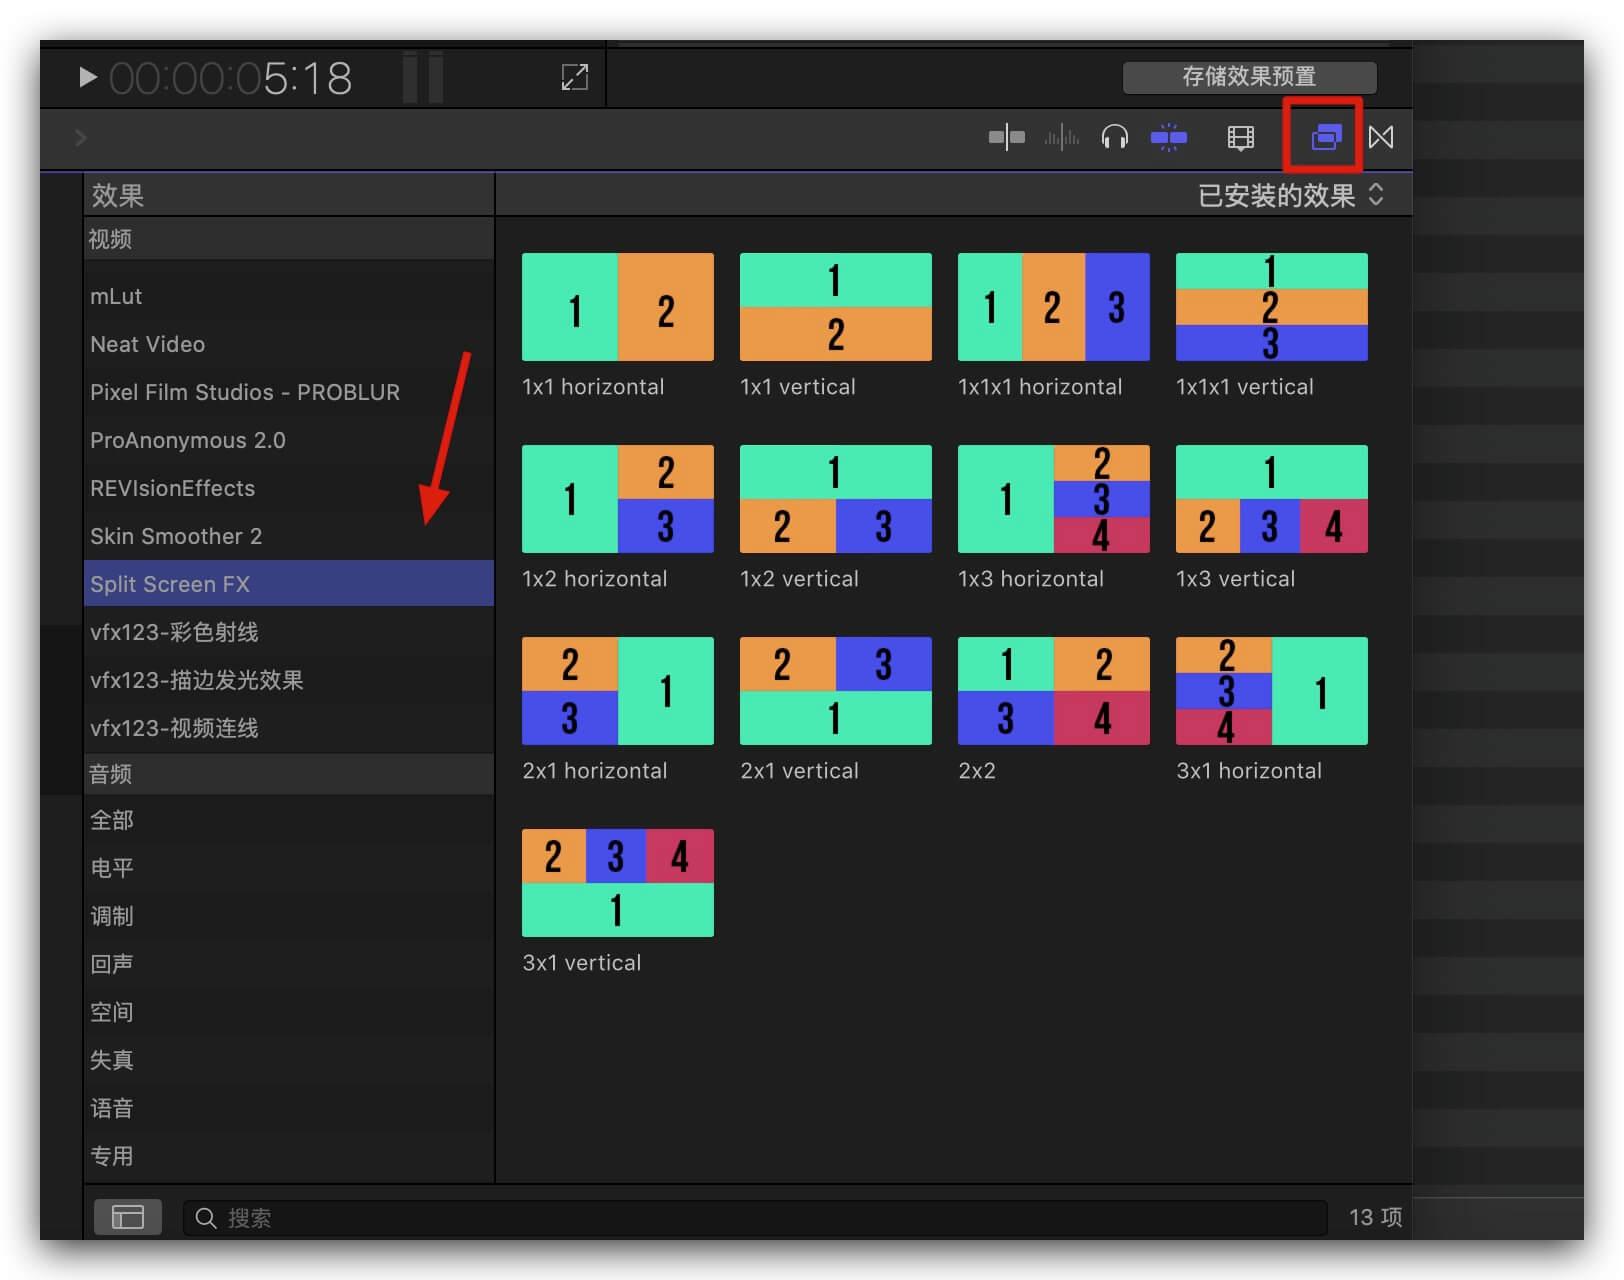 fcpx分屏插件 13种支持4K果冻动画效果分屏预设 Split Screen Effects Kit